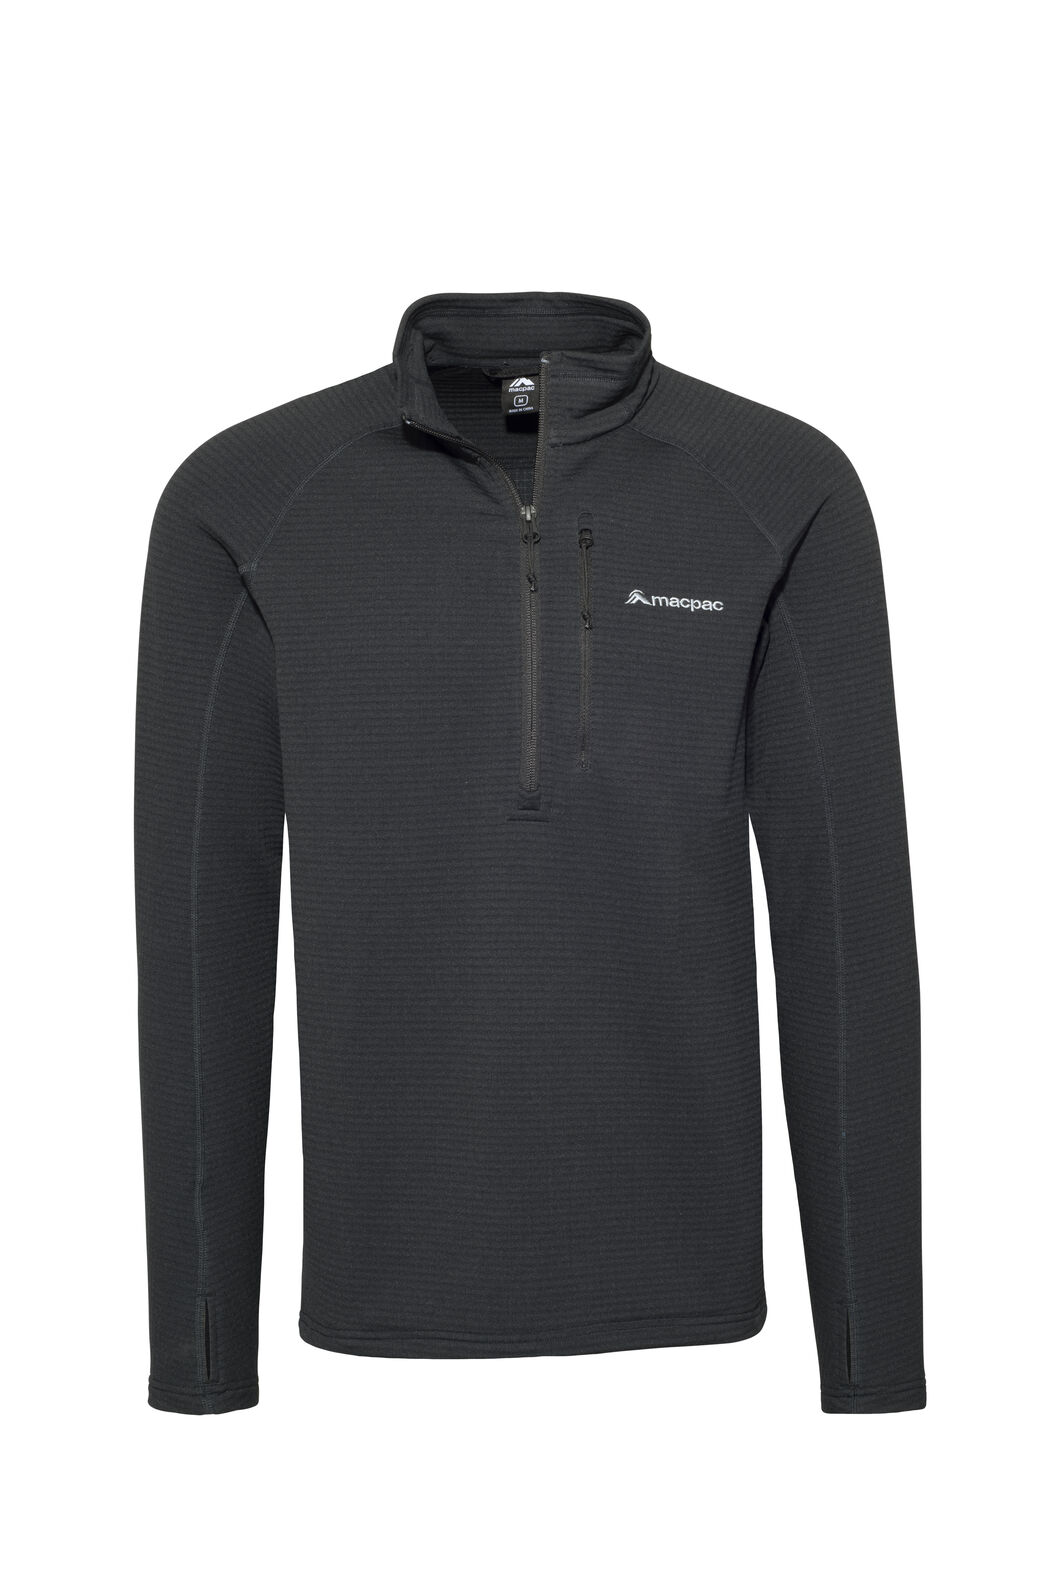 Macpac Men's Ion Polartec® Fleece Half Zip Pullover, Black, hi-res